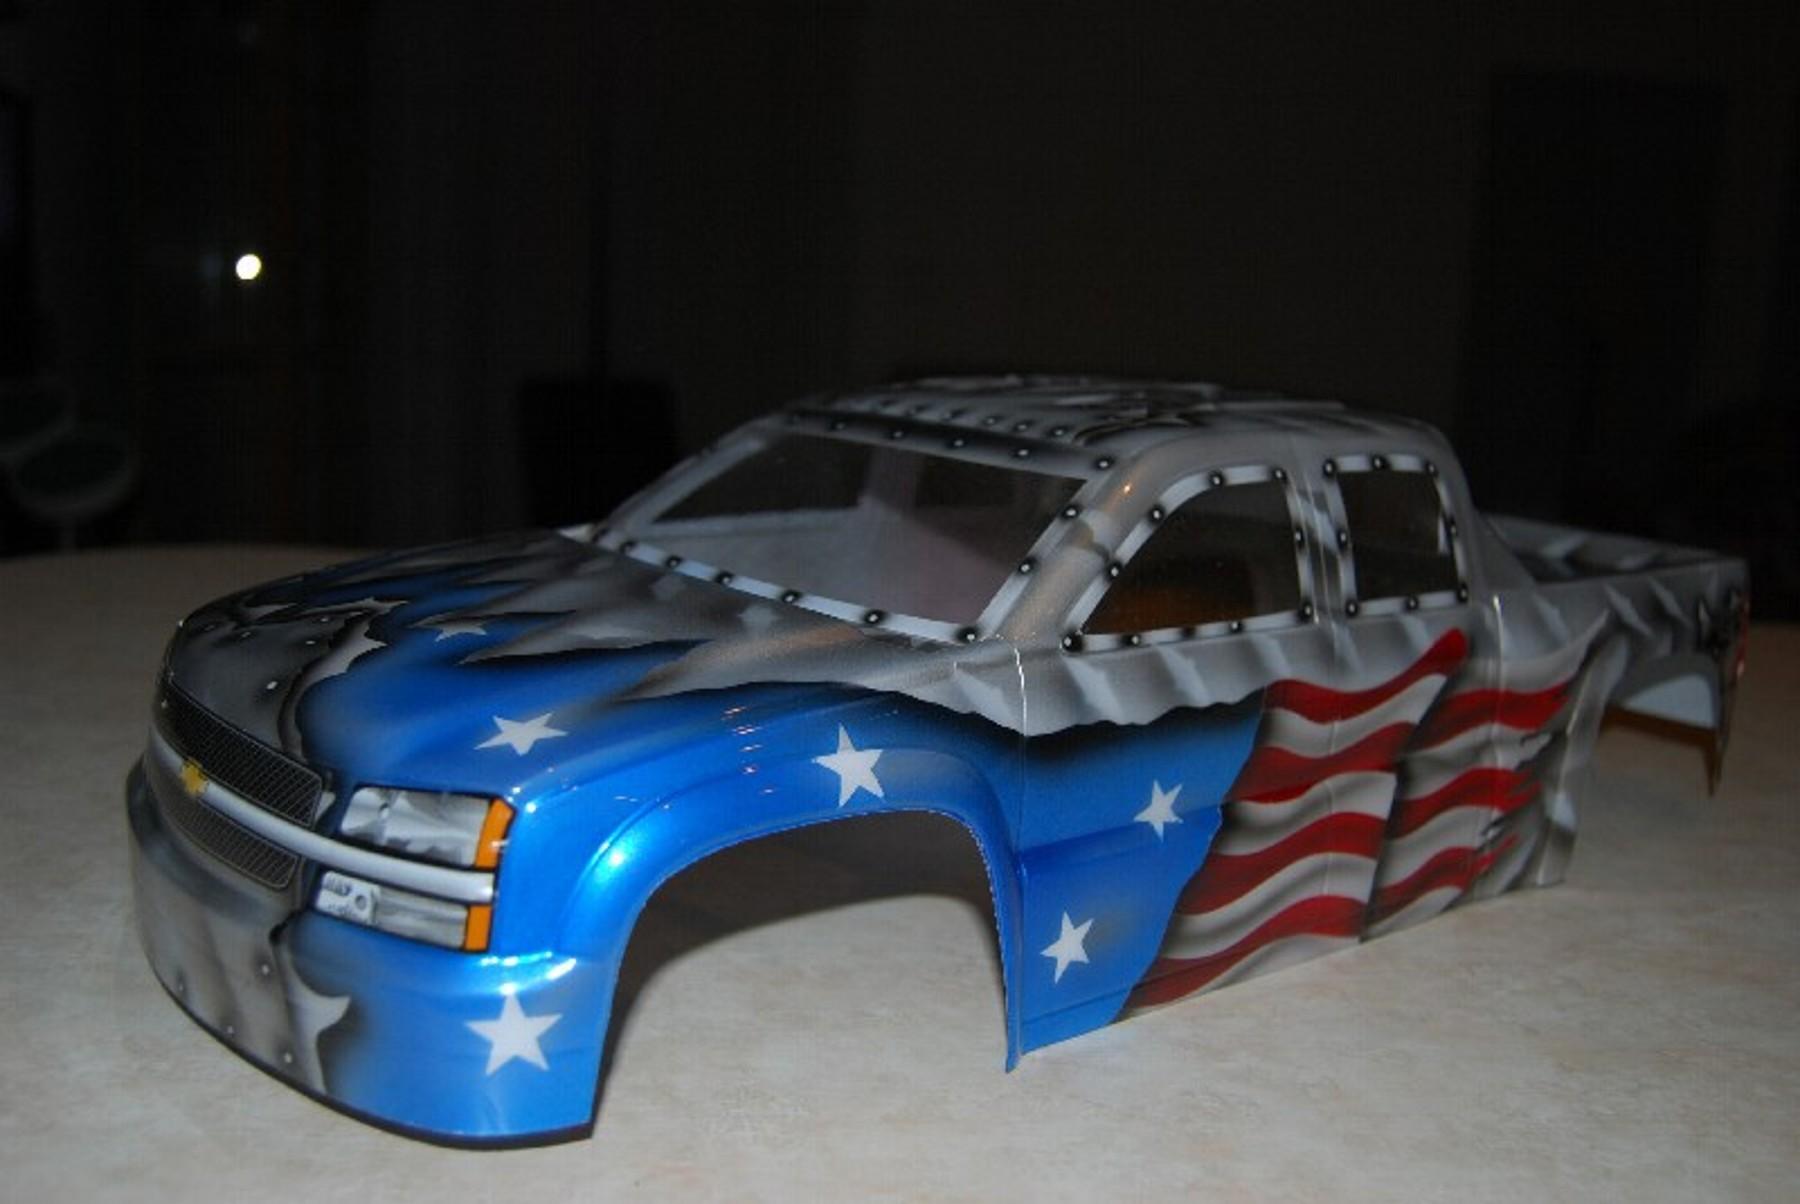 Silverado Trucks For Sale >> F/S Custom painted Chevy truck body - R/C Tech Forums